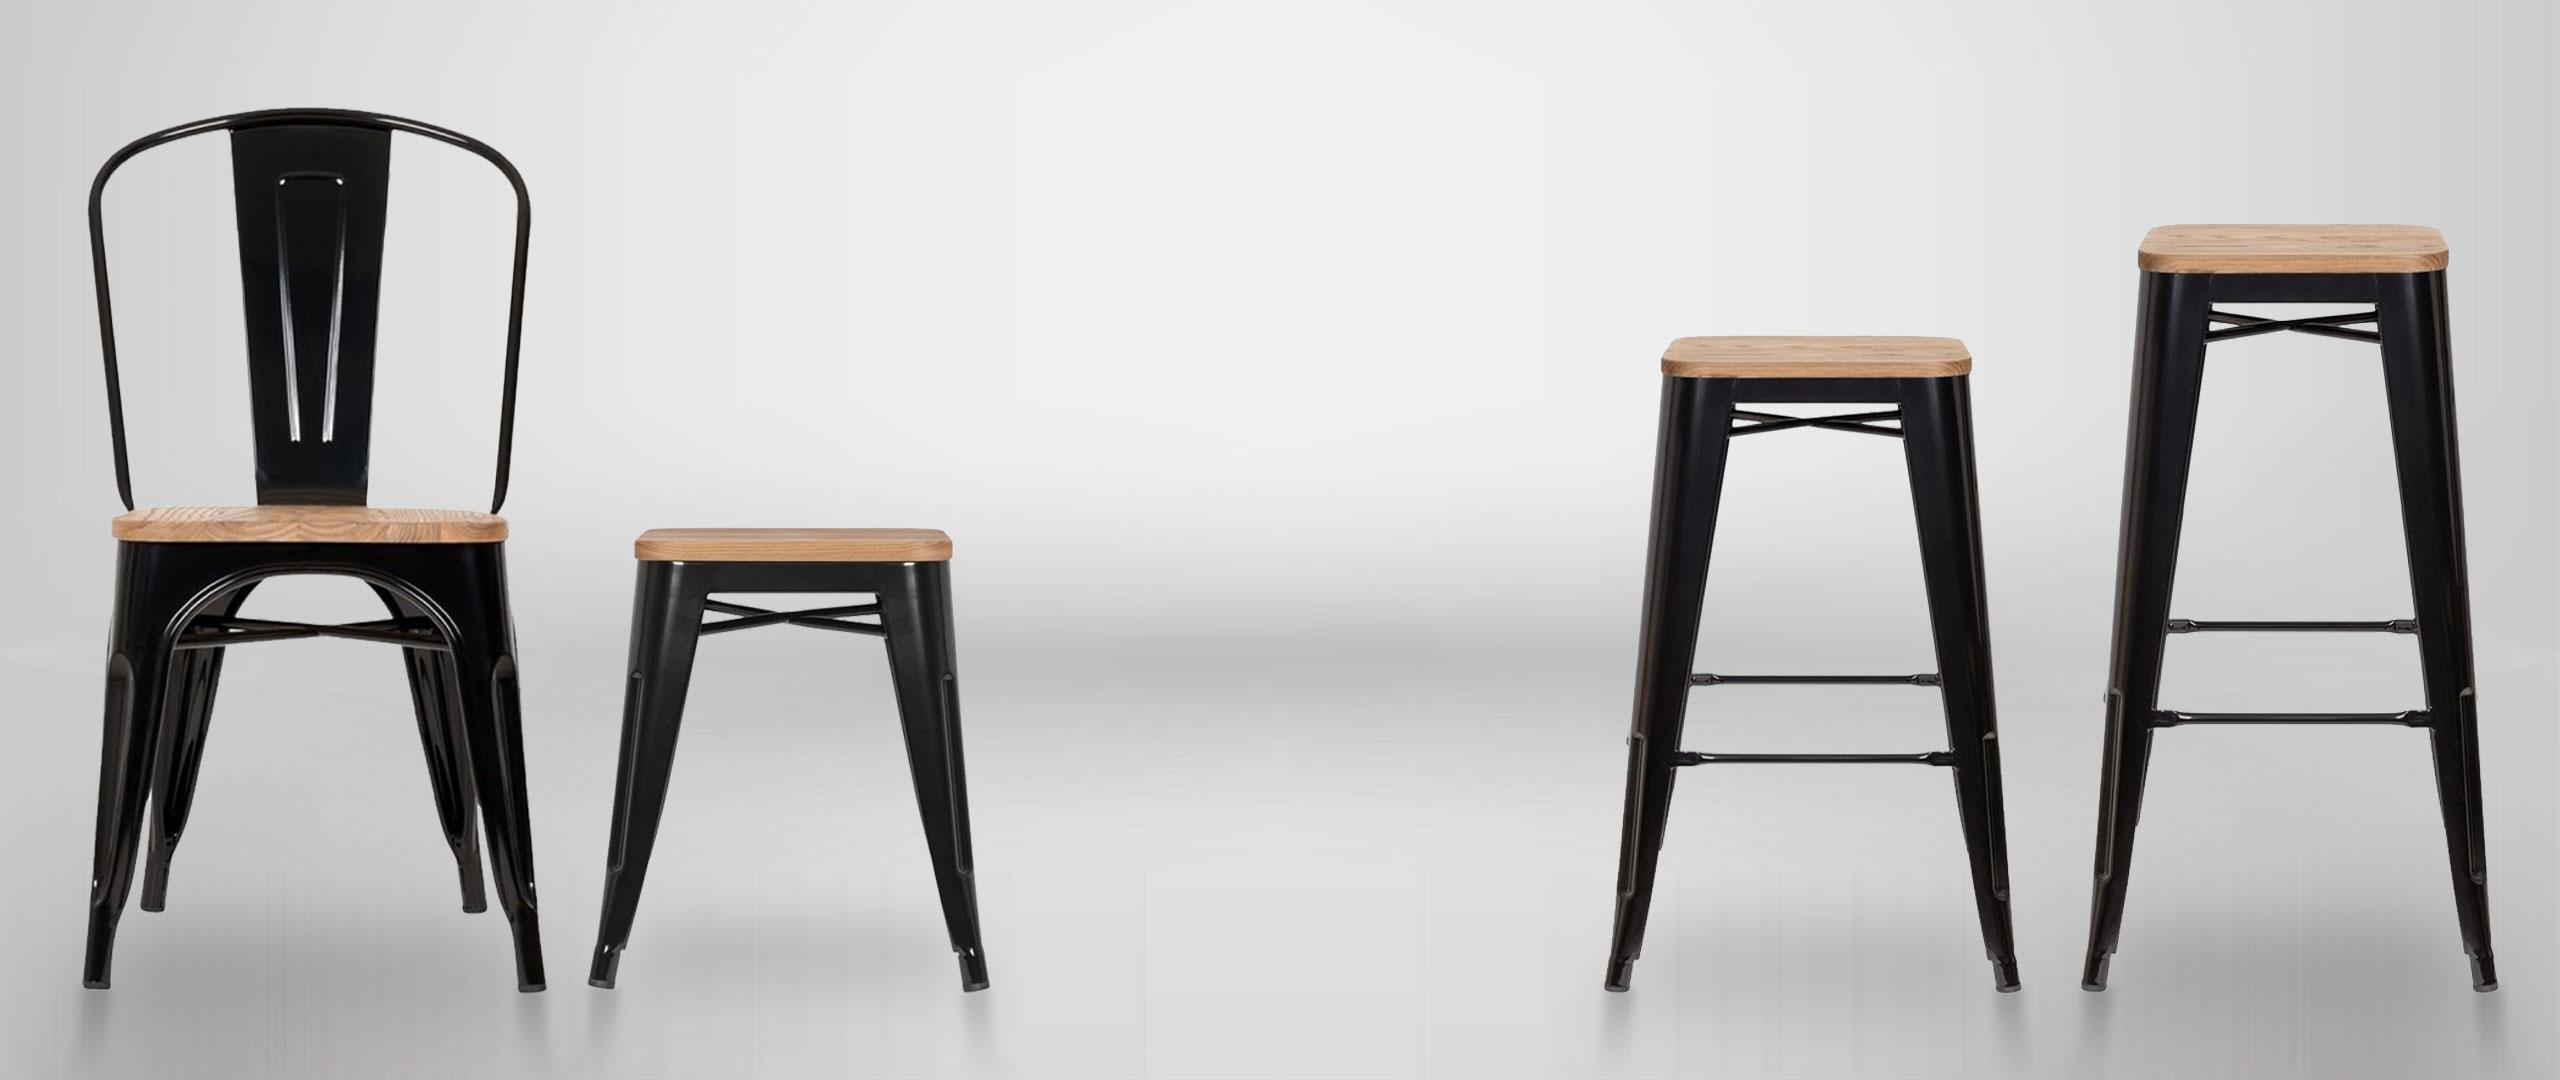 Tolix Chairs & Stools